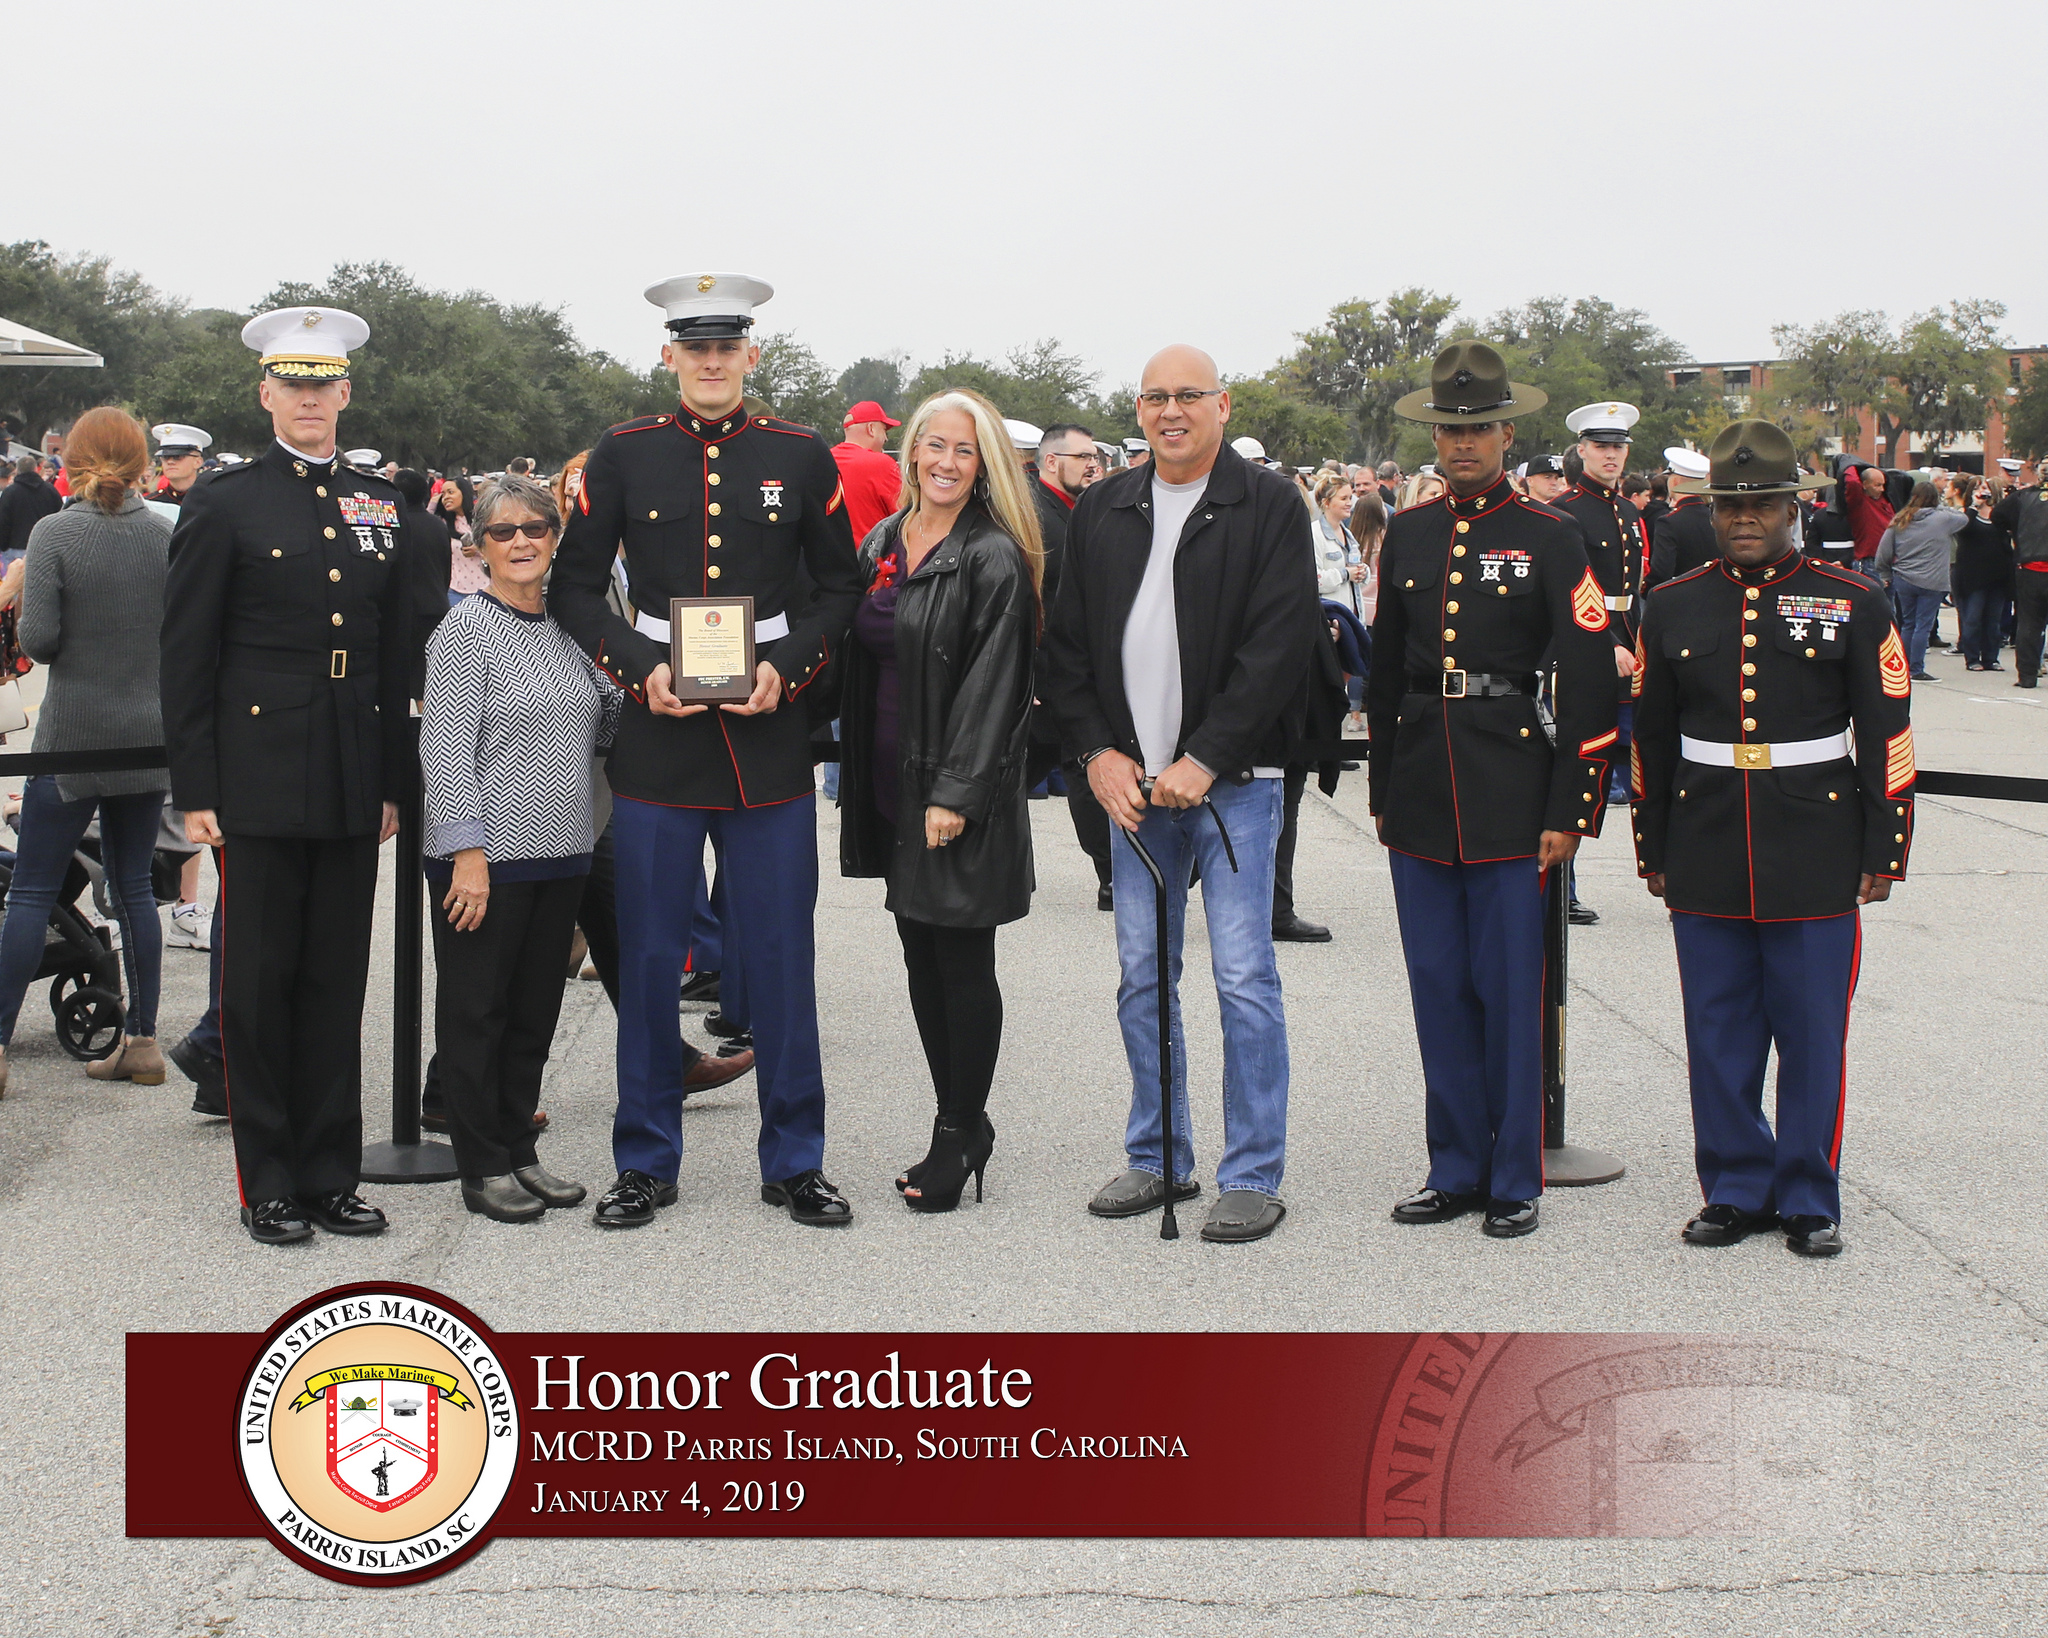 Palm Harbor, Florida native earns platoon honor graduate